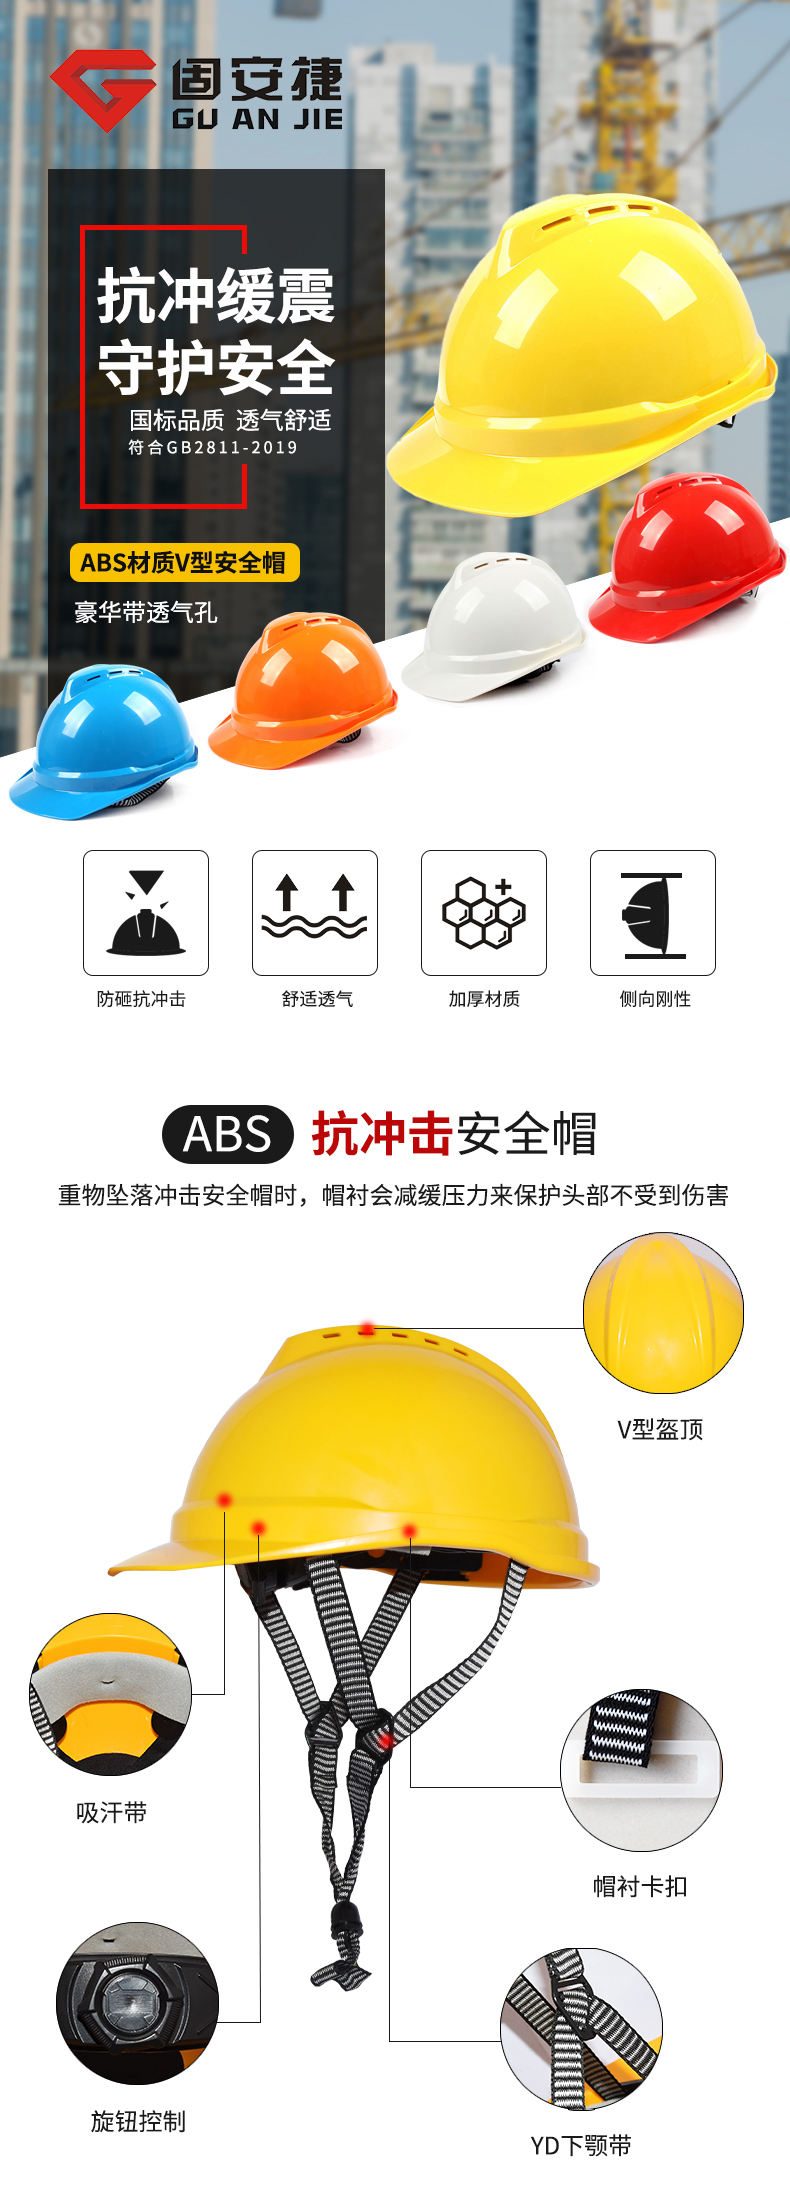 GUANJIE固安捷1552 豪华ABS带透气孔V型安全帽旋钮帽衬(YC型下颚带旋钮调节)-白色